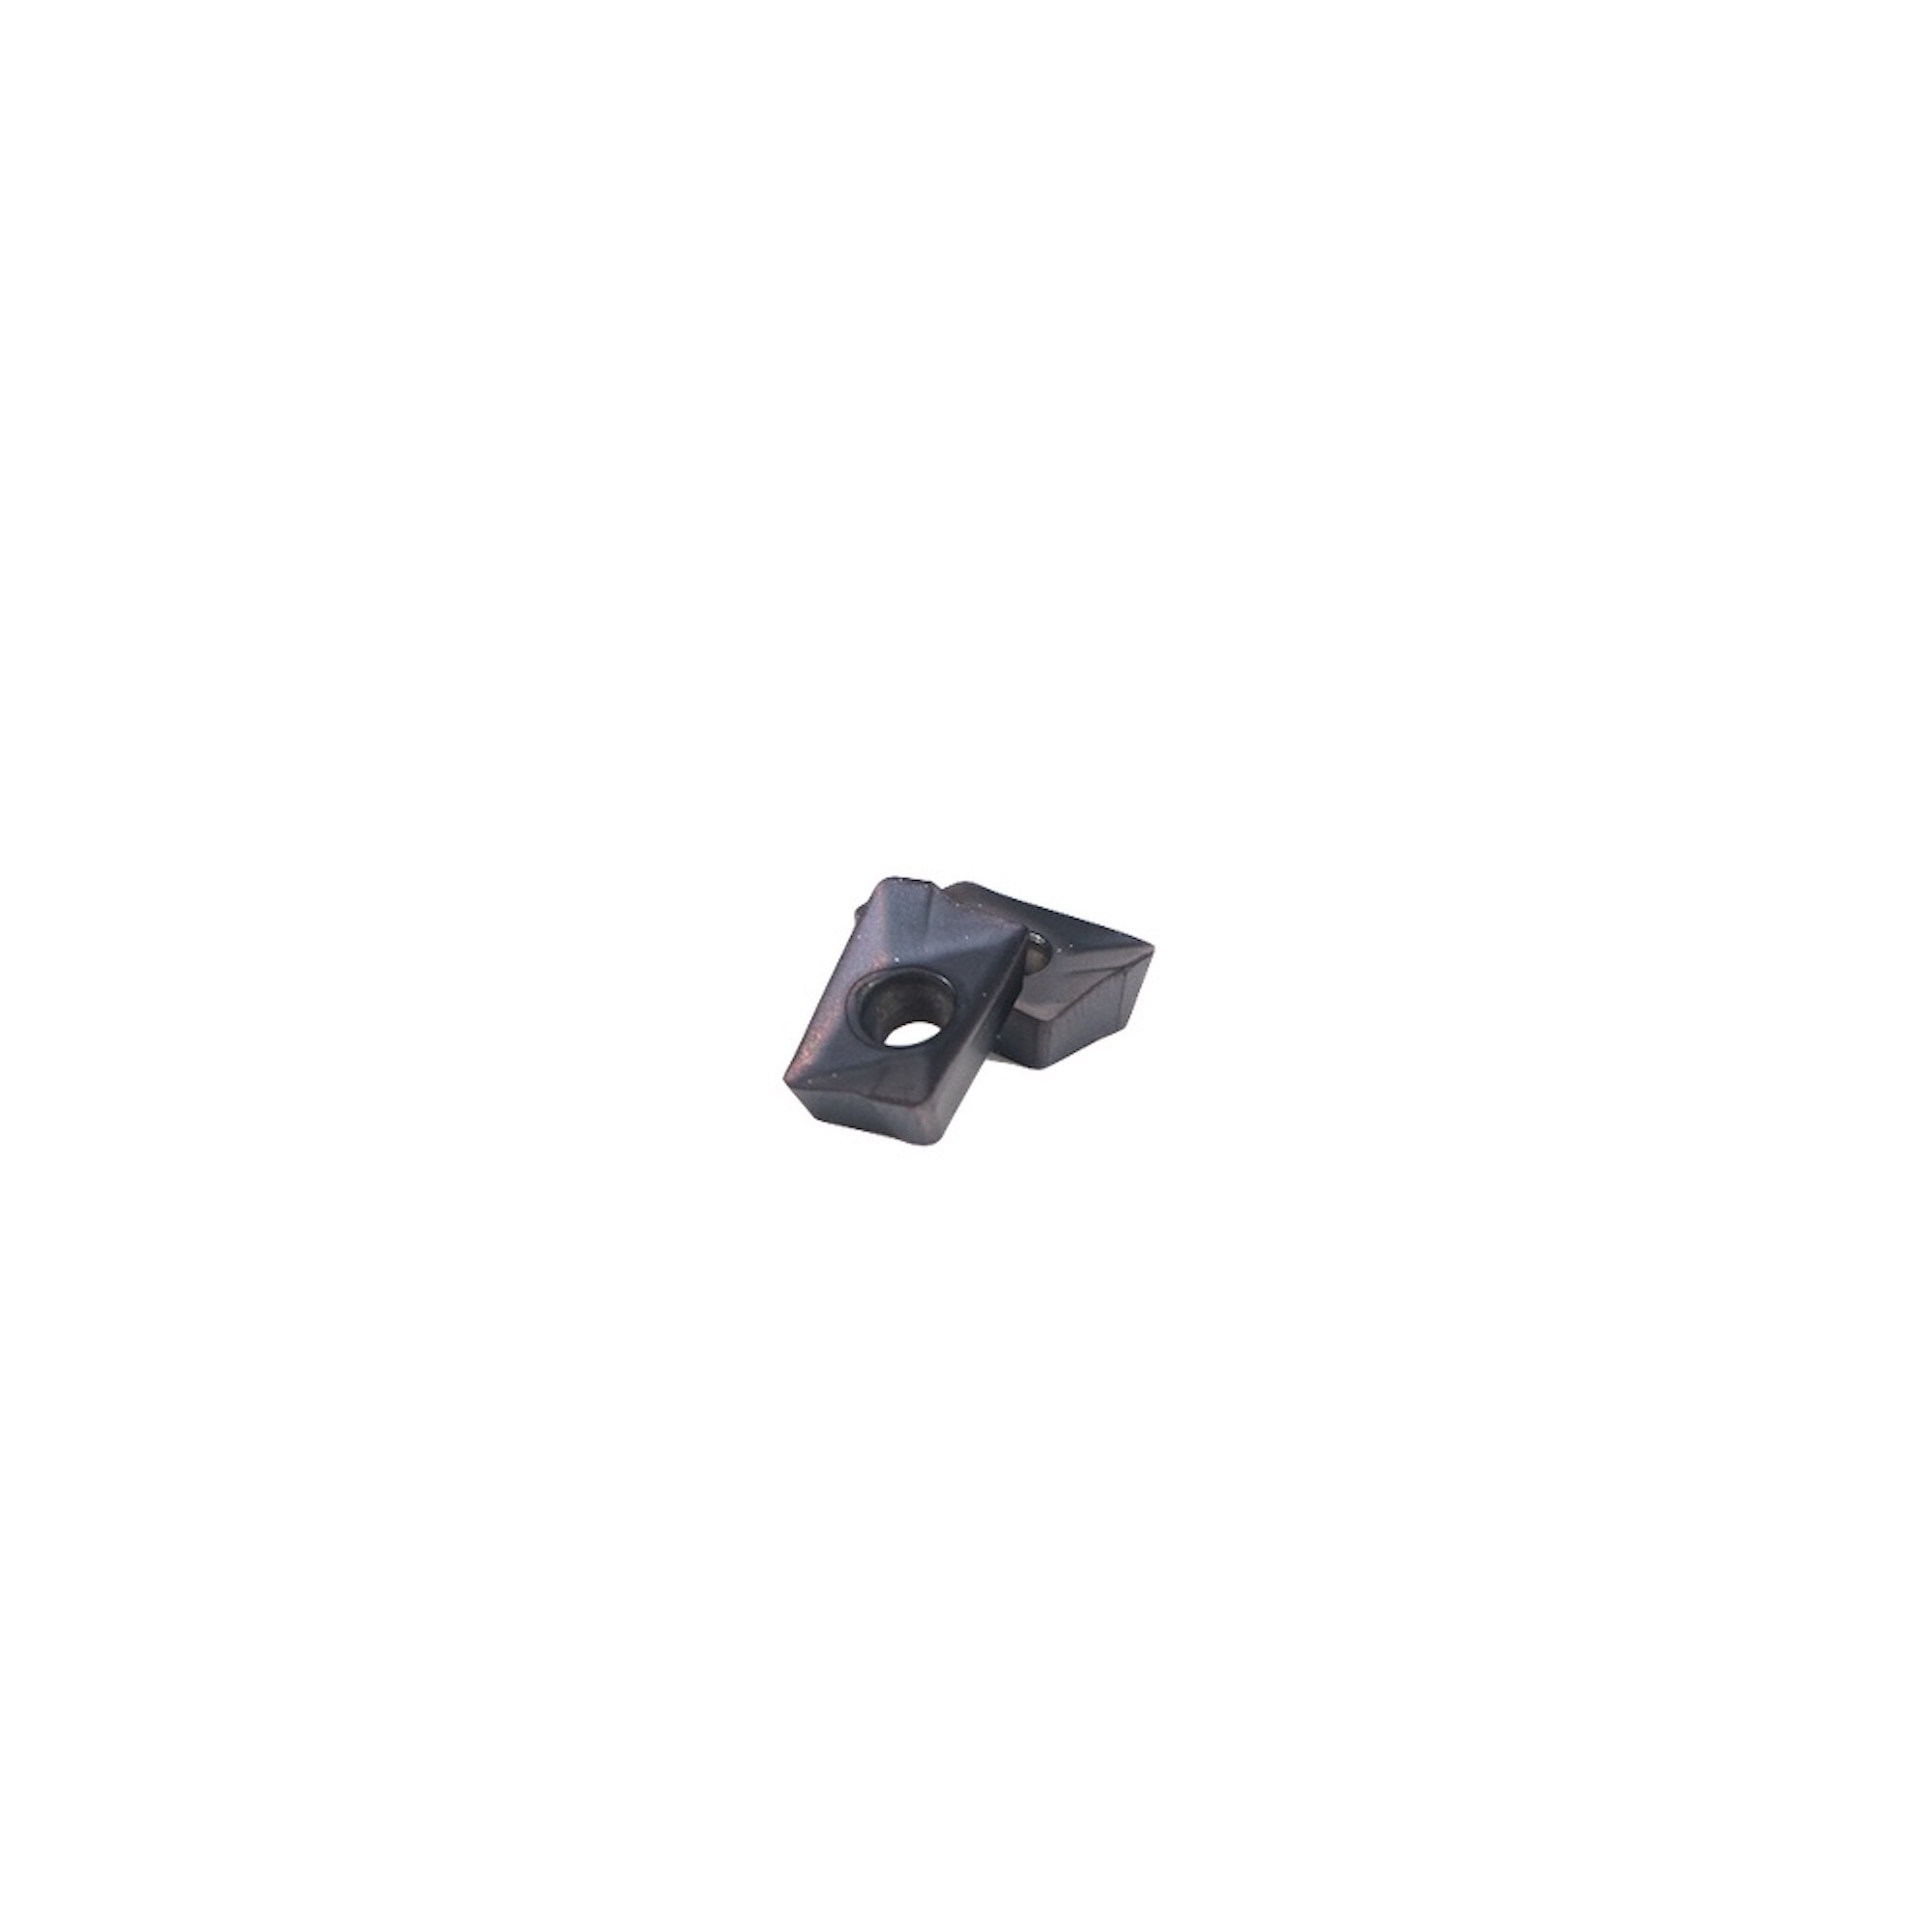 Pastilha de metal duro com revestimento APKT100308 PDTR CM UN300 para fresa intercambiável referência Unik7